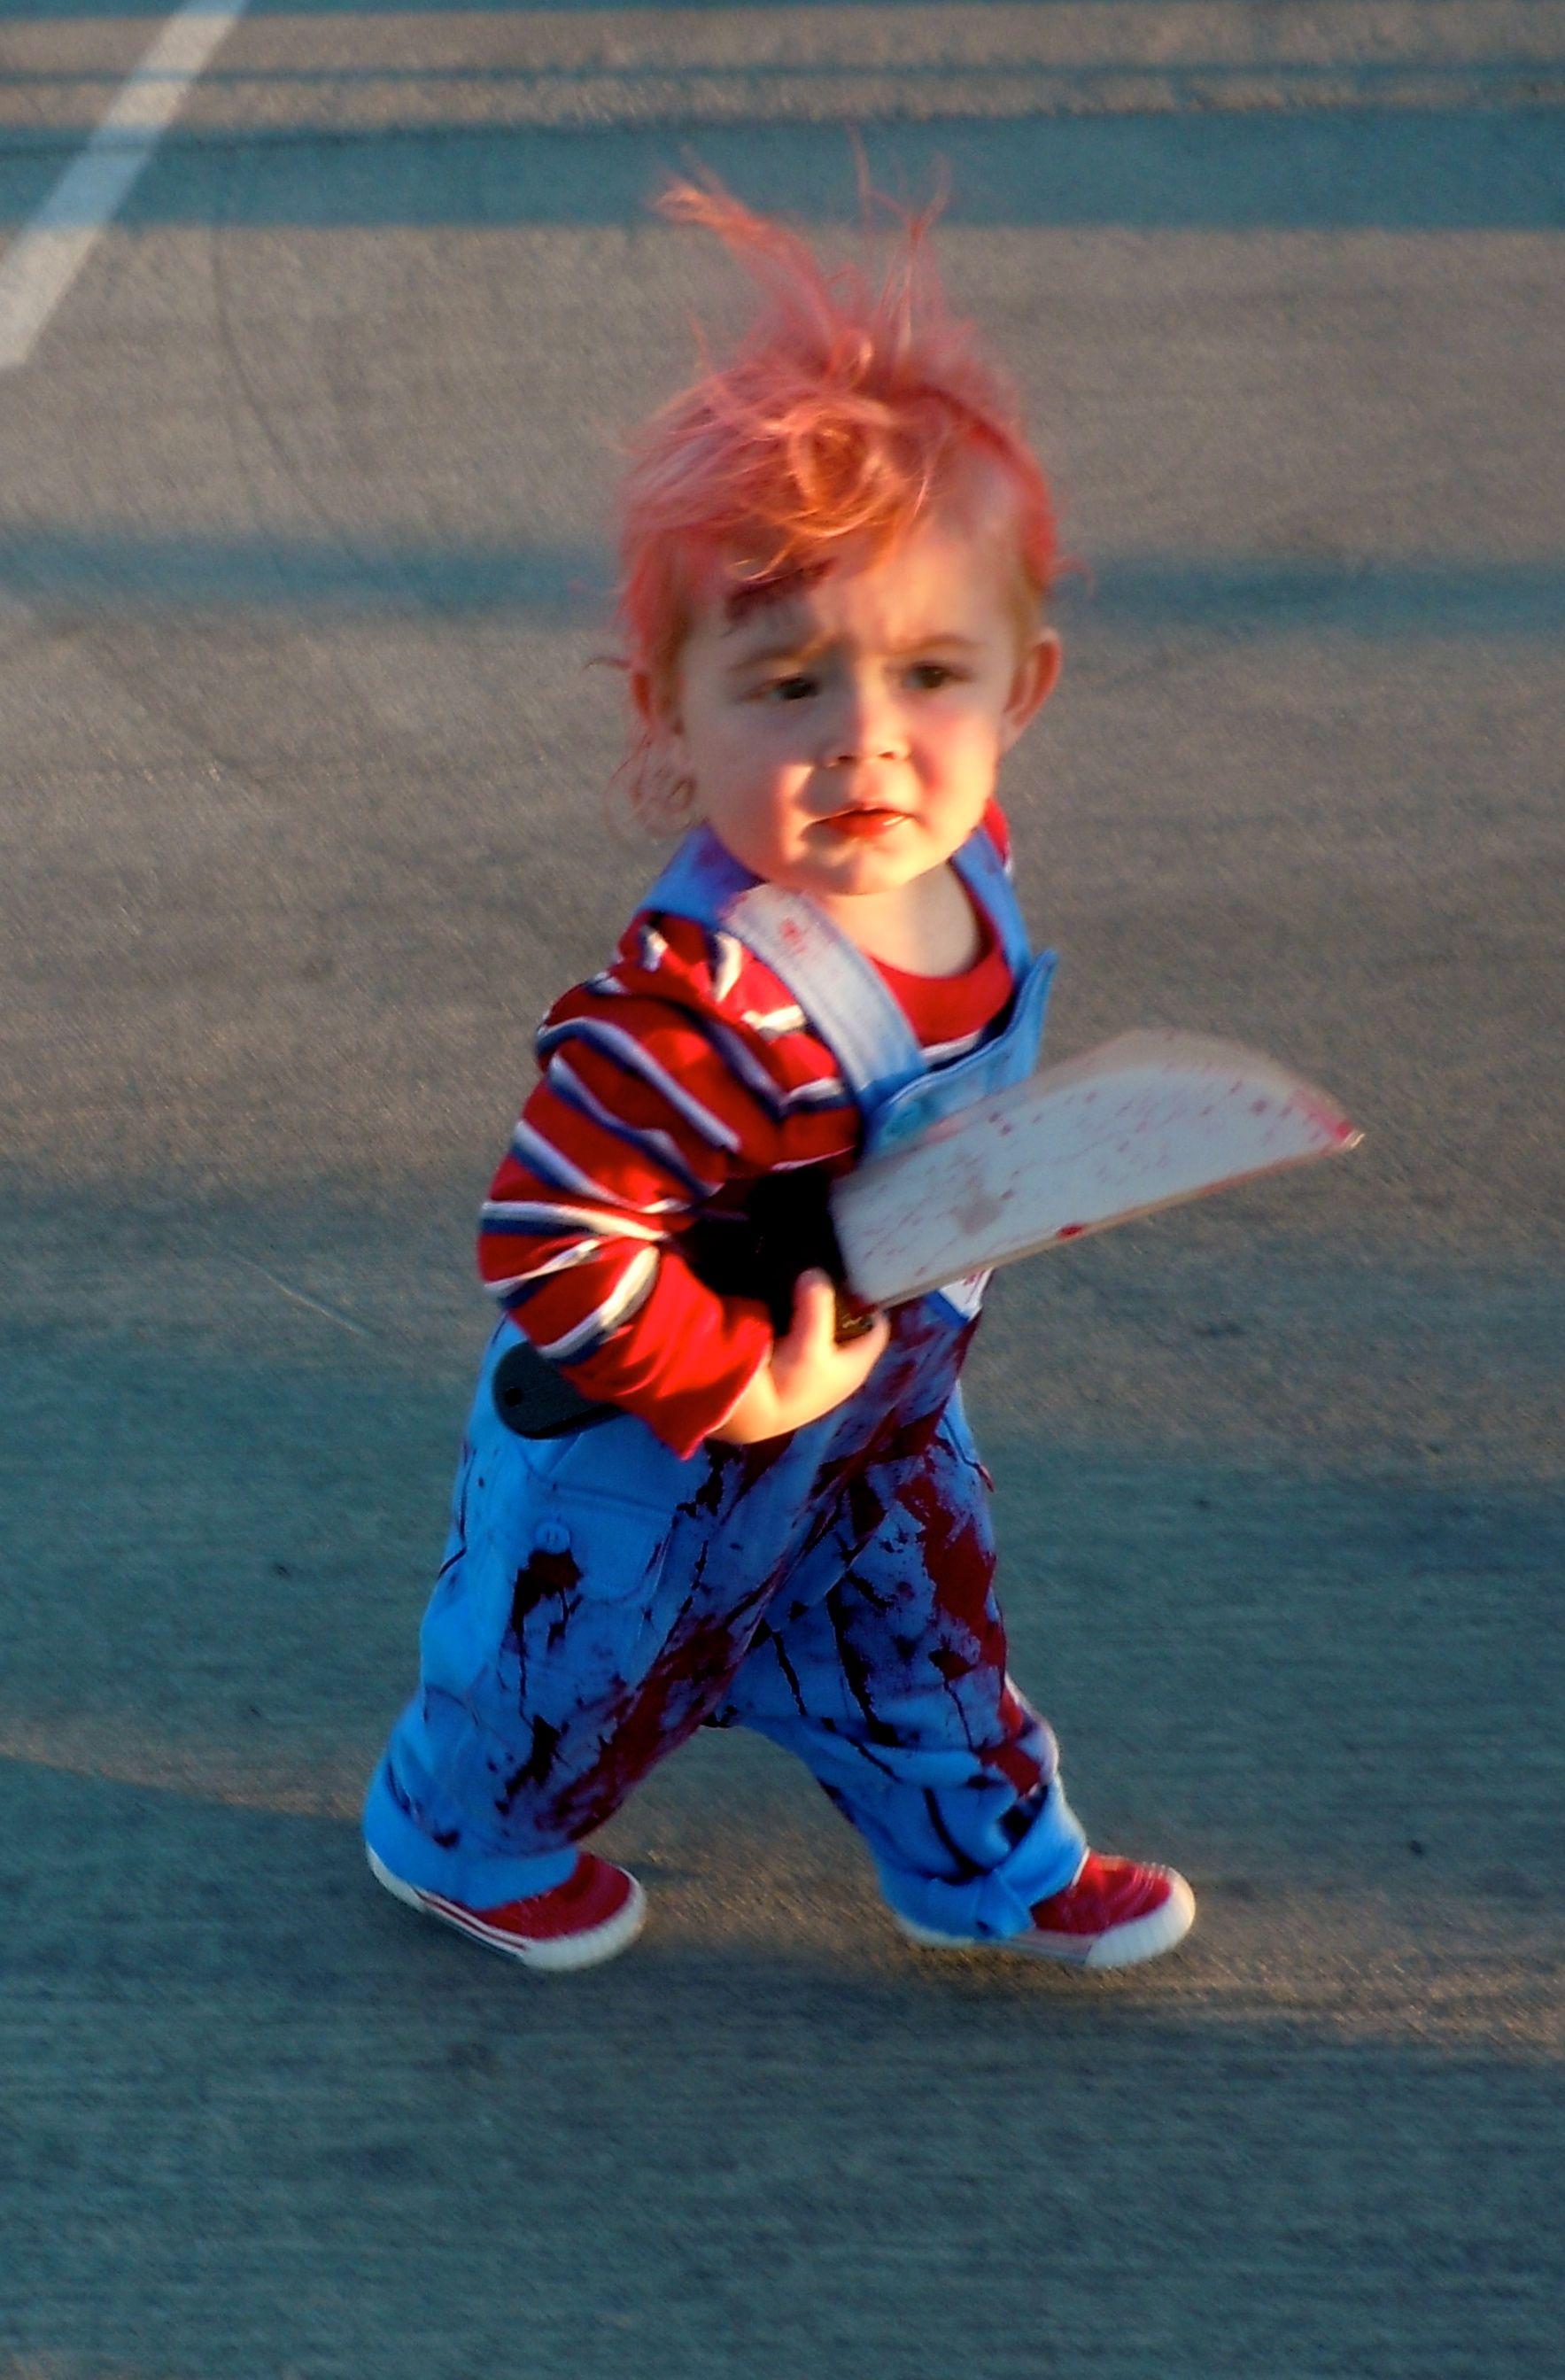 Scary Little Chucky Kids Halloween Costume